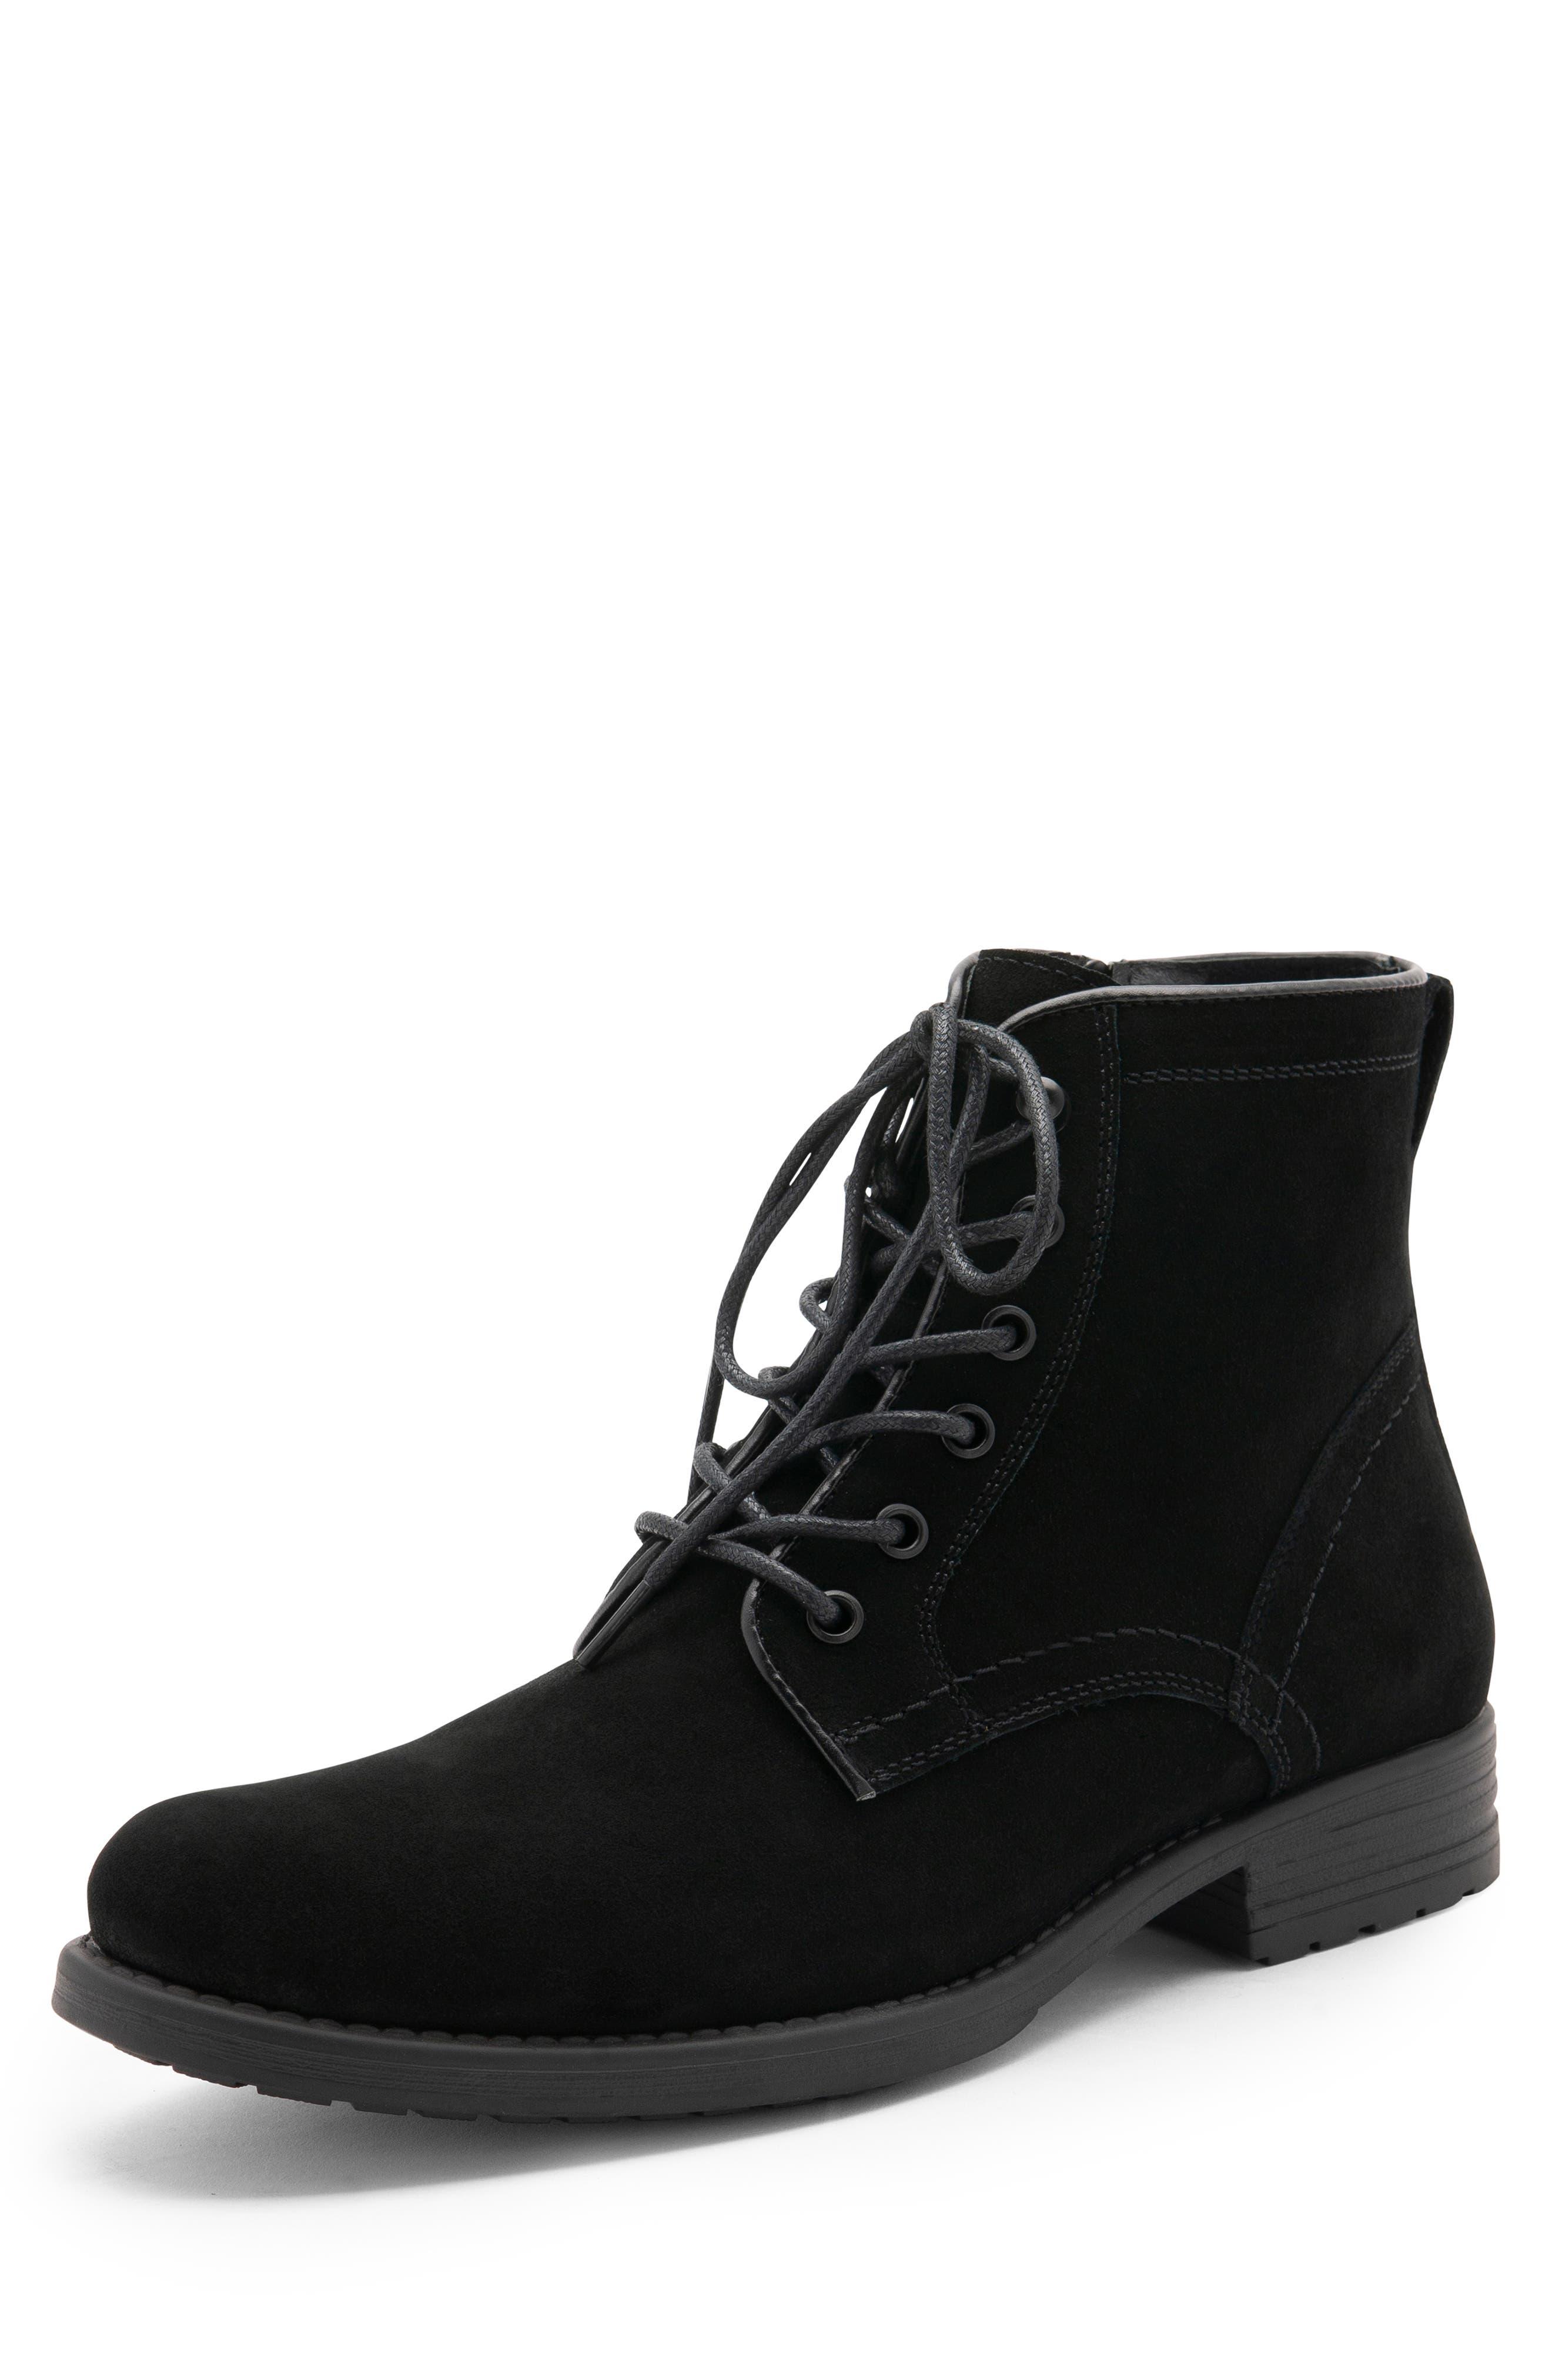 BLONDO, Peter Waterproof Plain Toe Boot, Alternate thumbnail 7, color, BLACK SUEDE